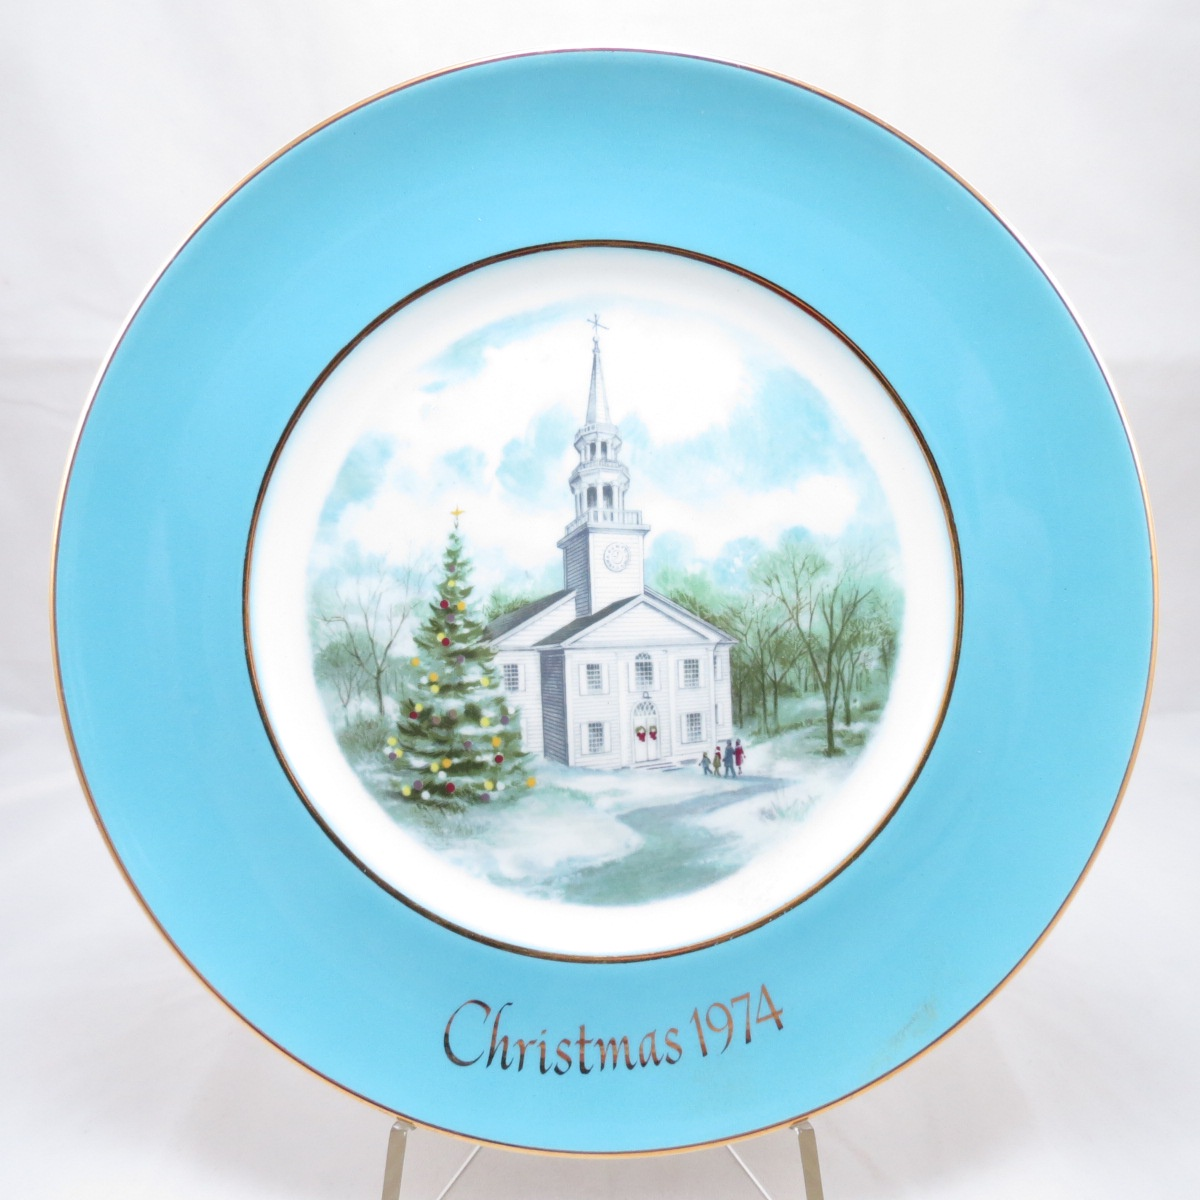 Декоративная тарелка Avon Products, Inc. Рождественские Воспоминания Эйвон, 101337414 avon